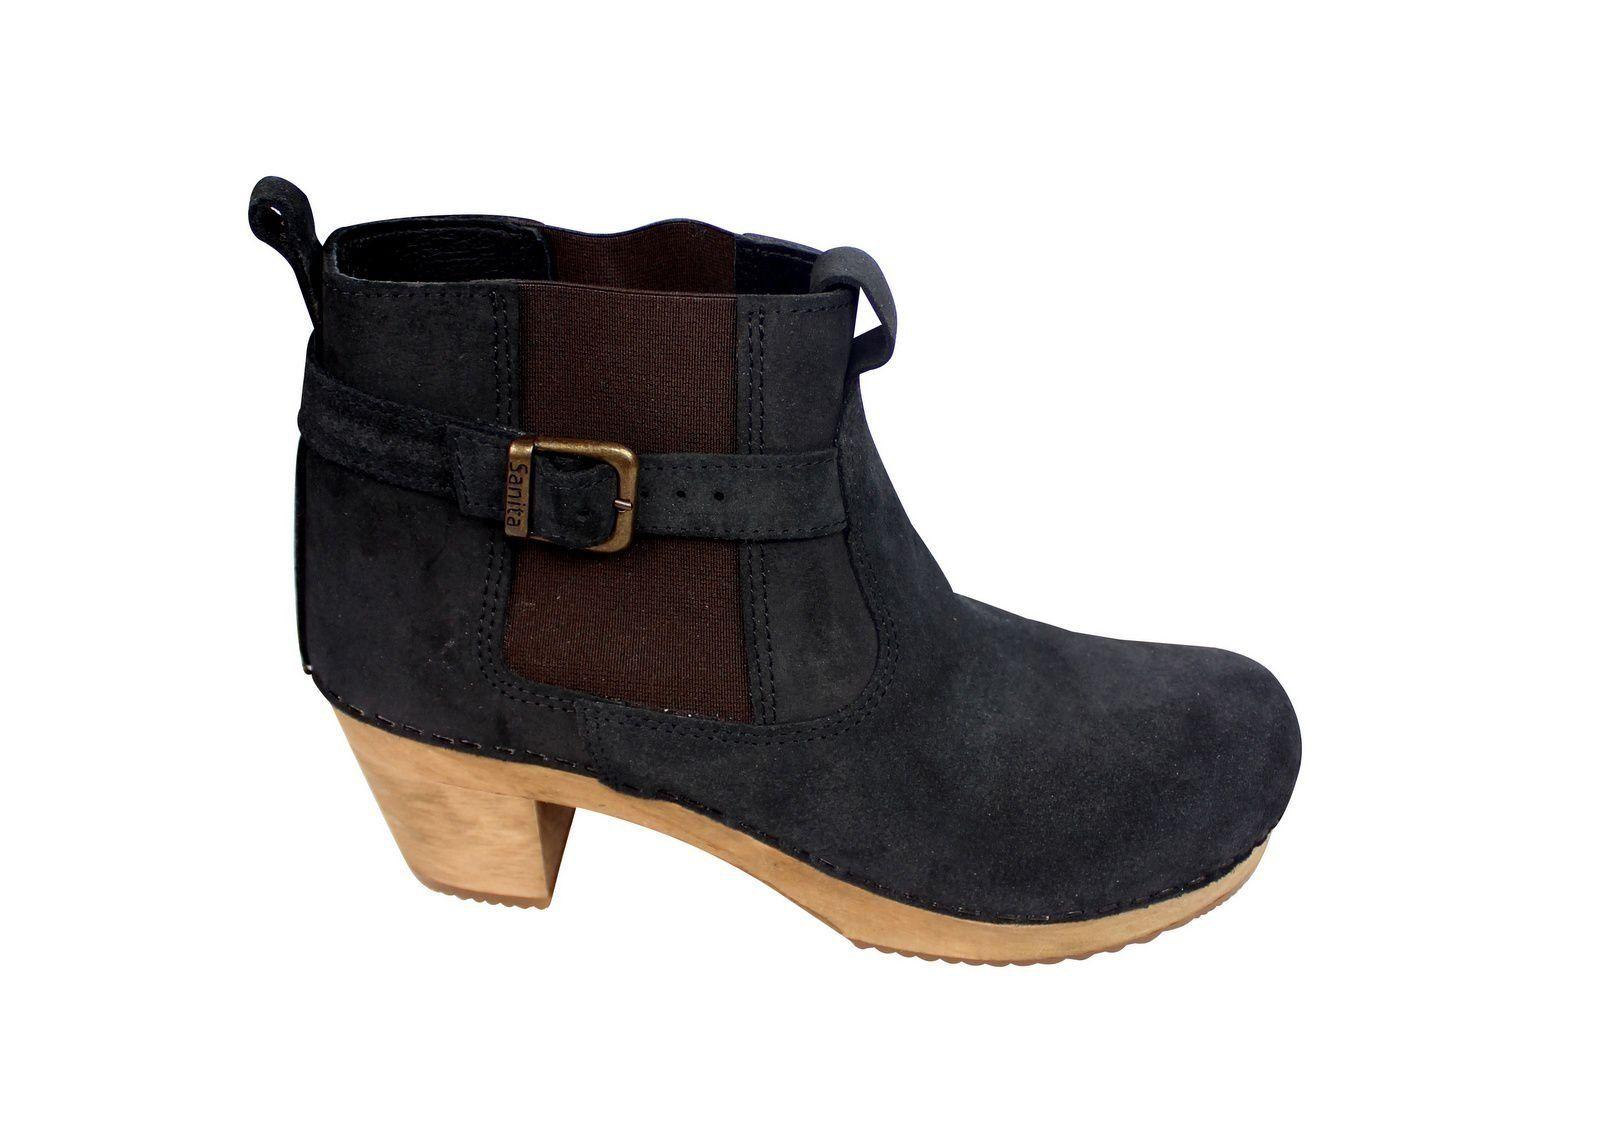 Sanita Peggy Sue Jodphur style ankle boots Black Side 2